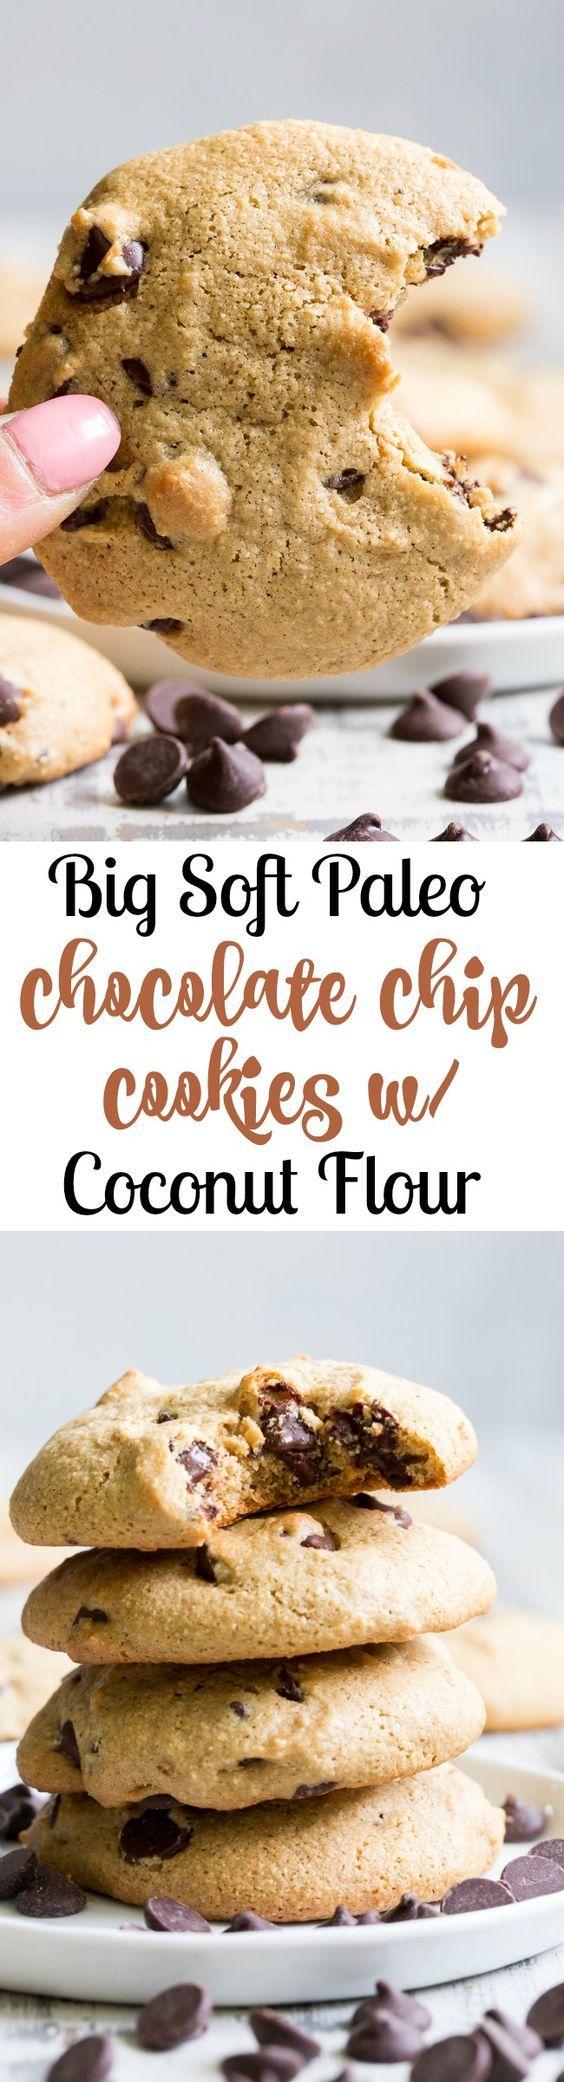 Big Soft Paleo Chocolate Chip Cookies with Tahini (Nut